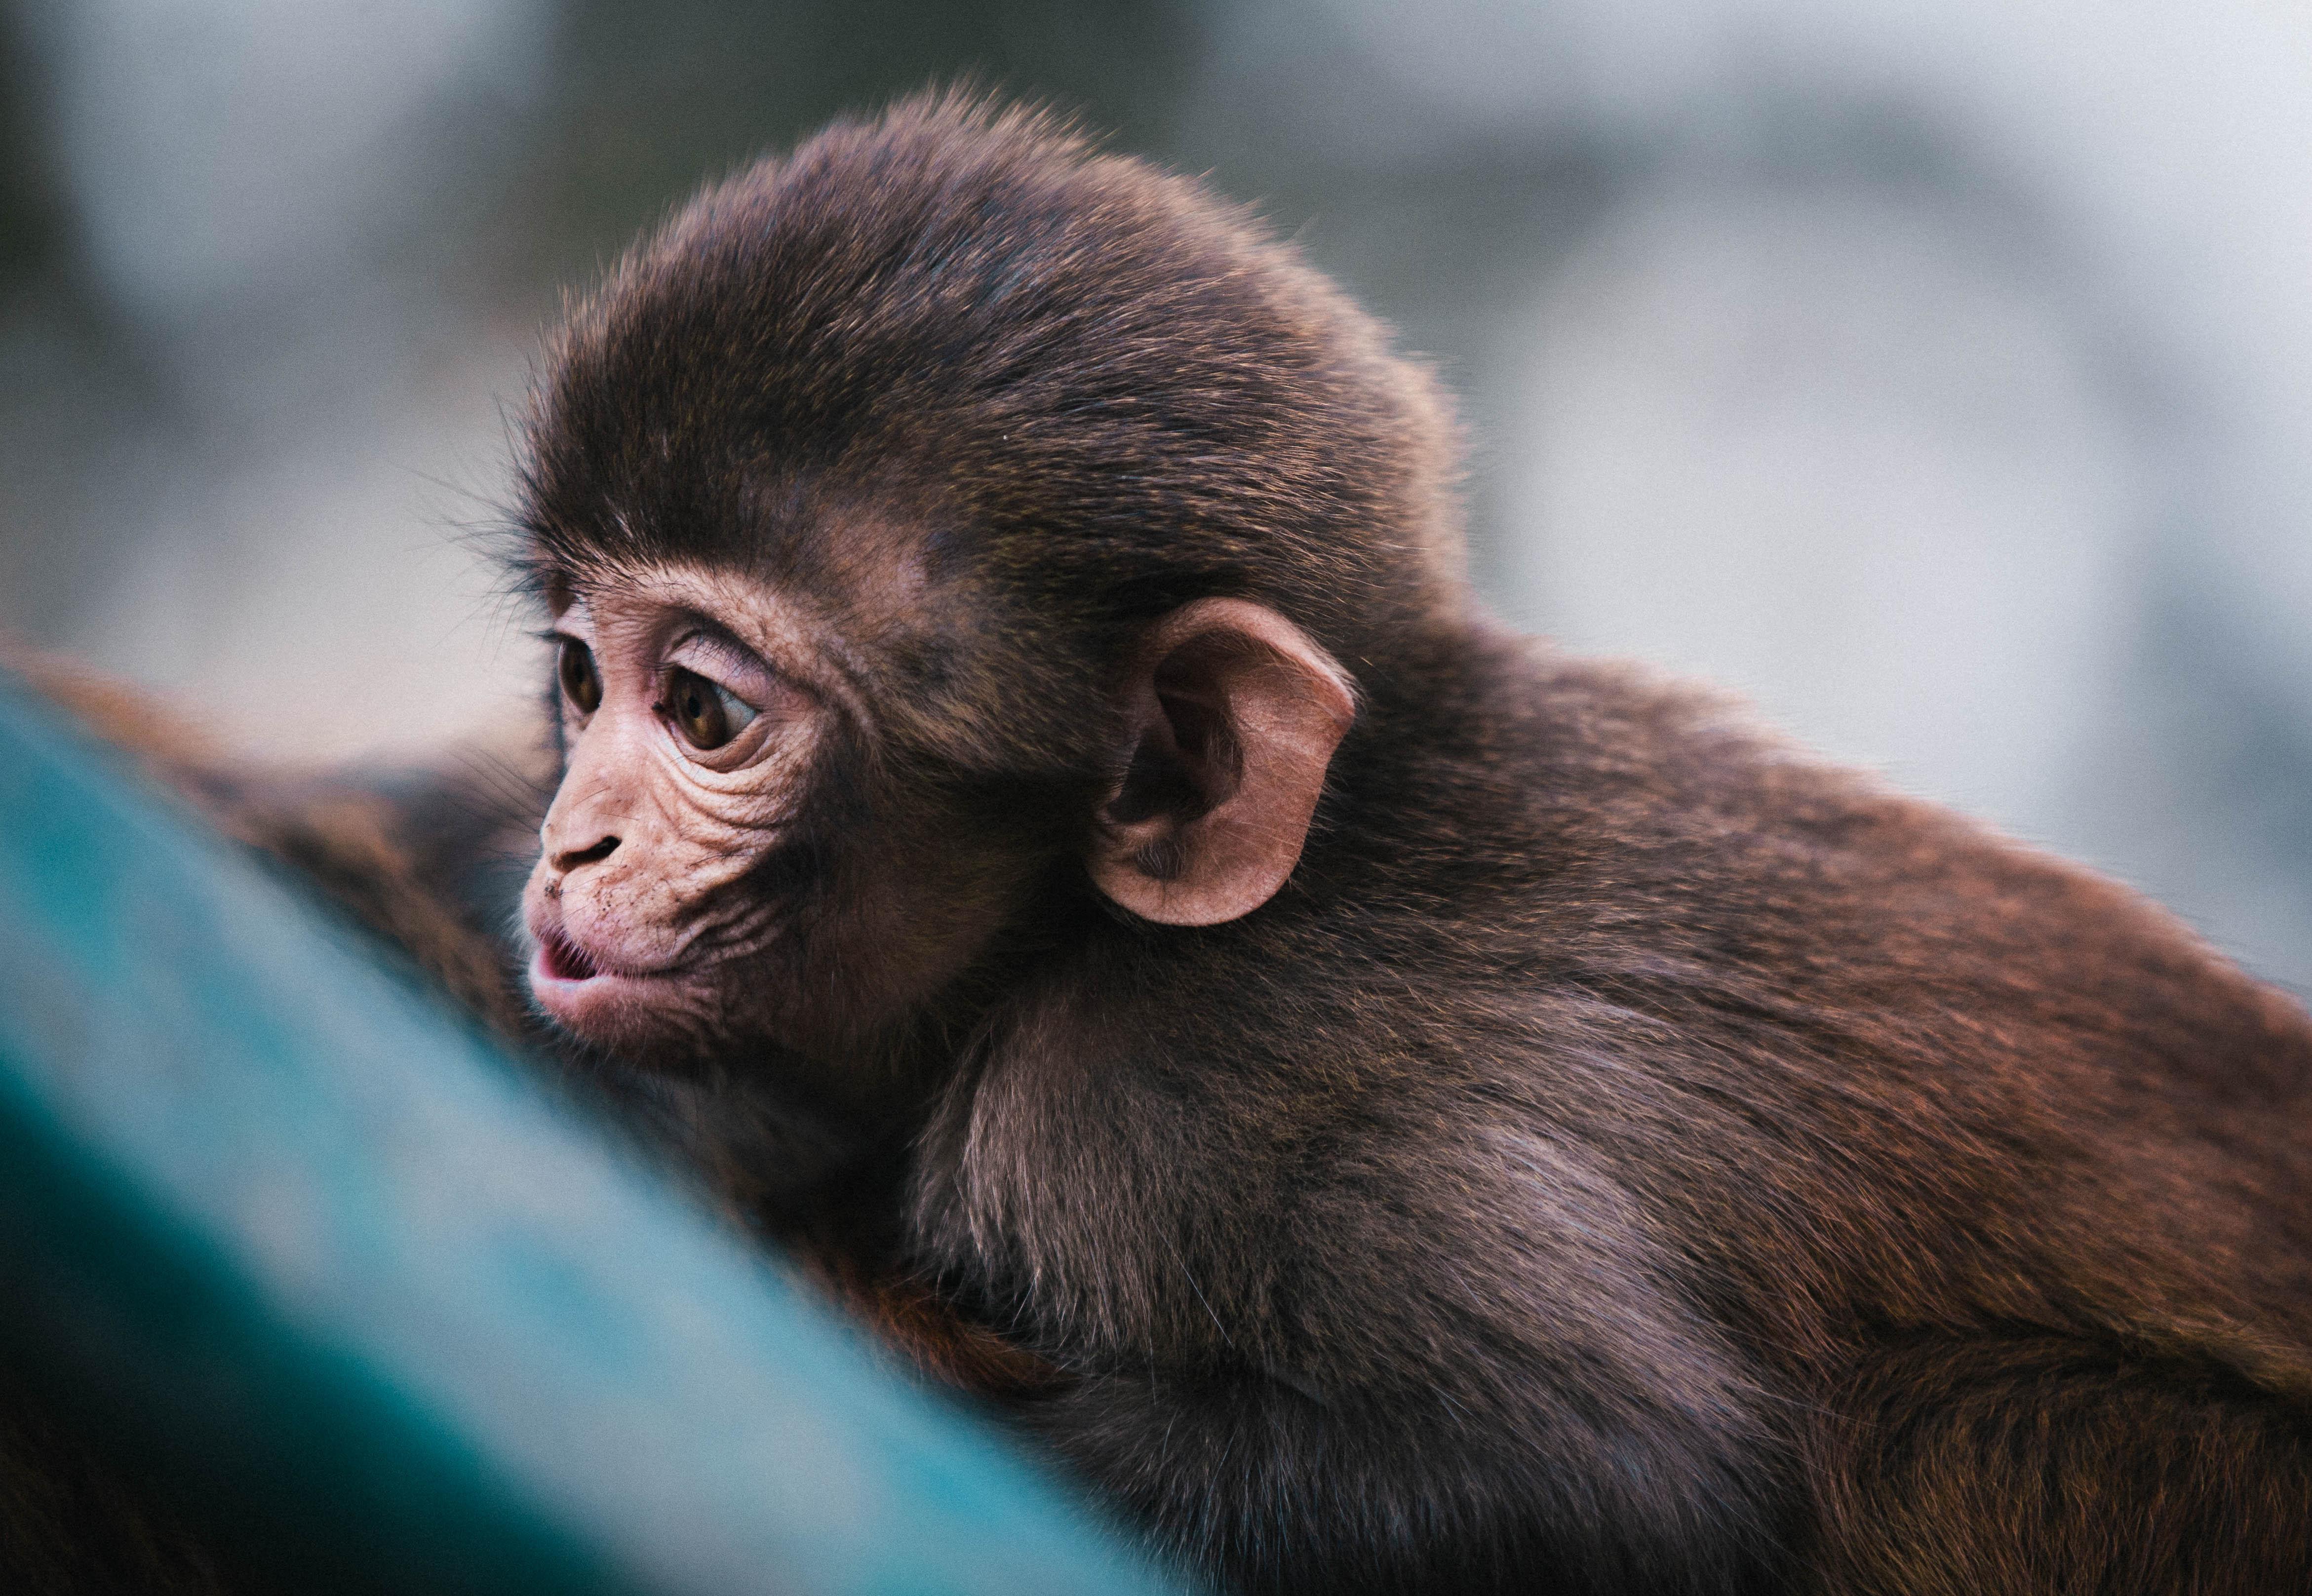 минус картинка обезьянка в мире знаете анекдоты